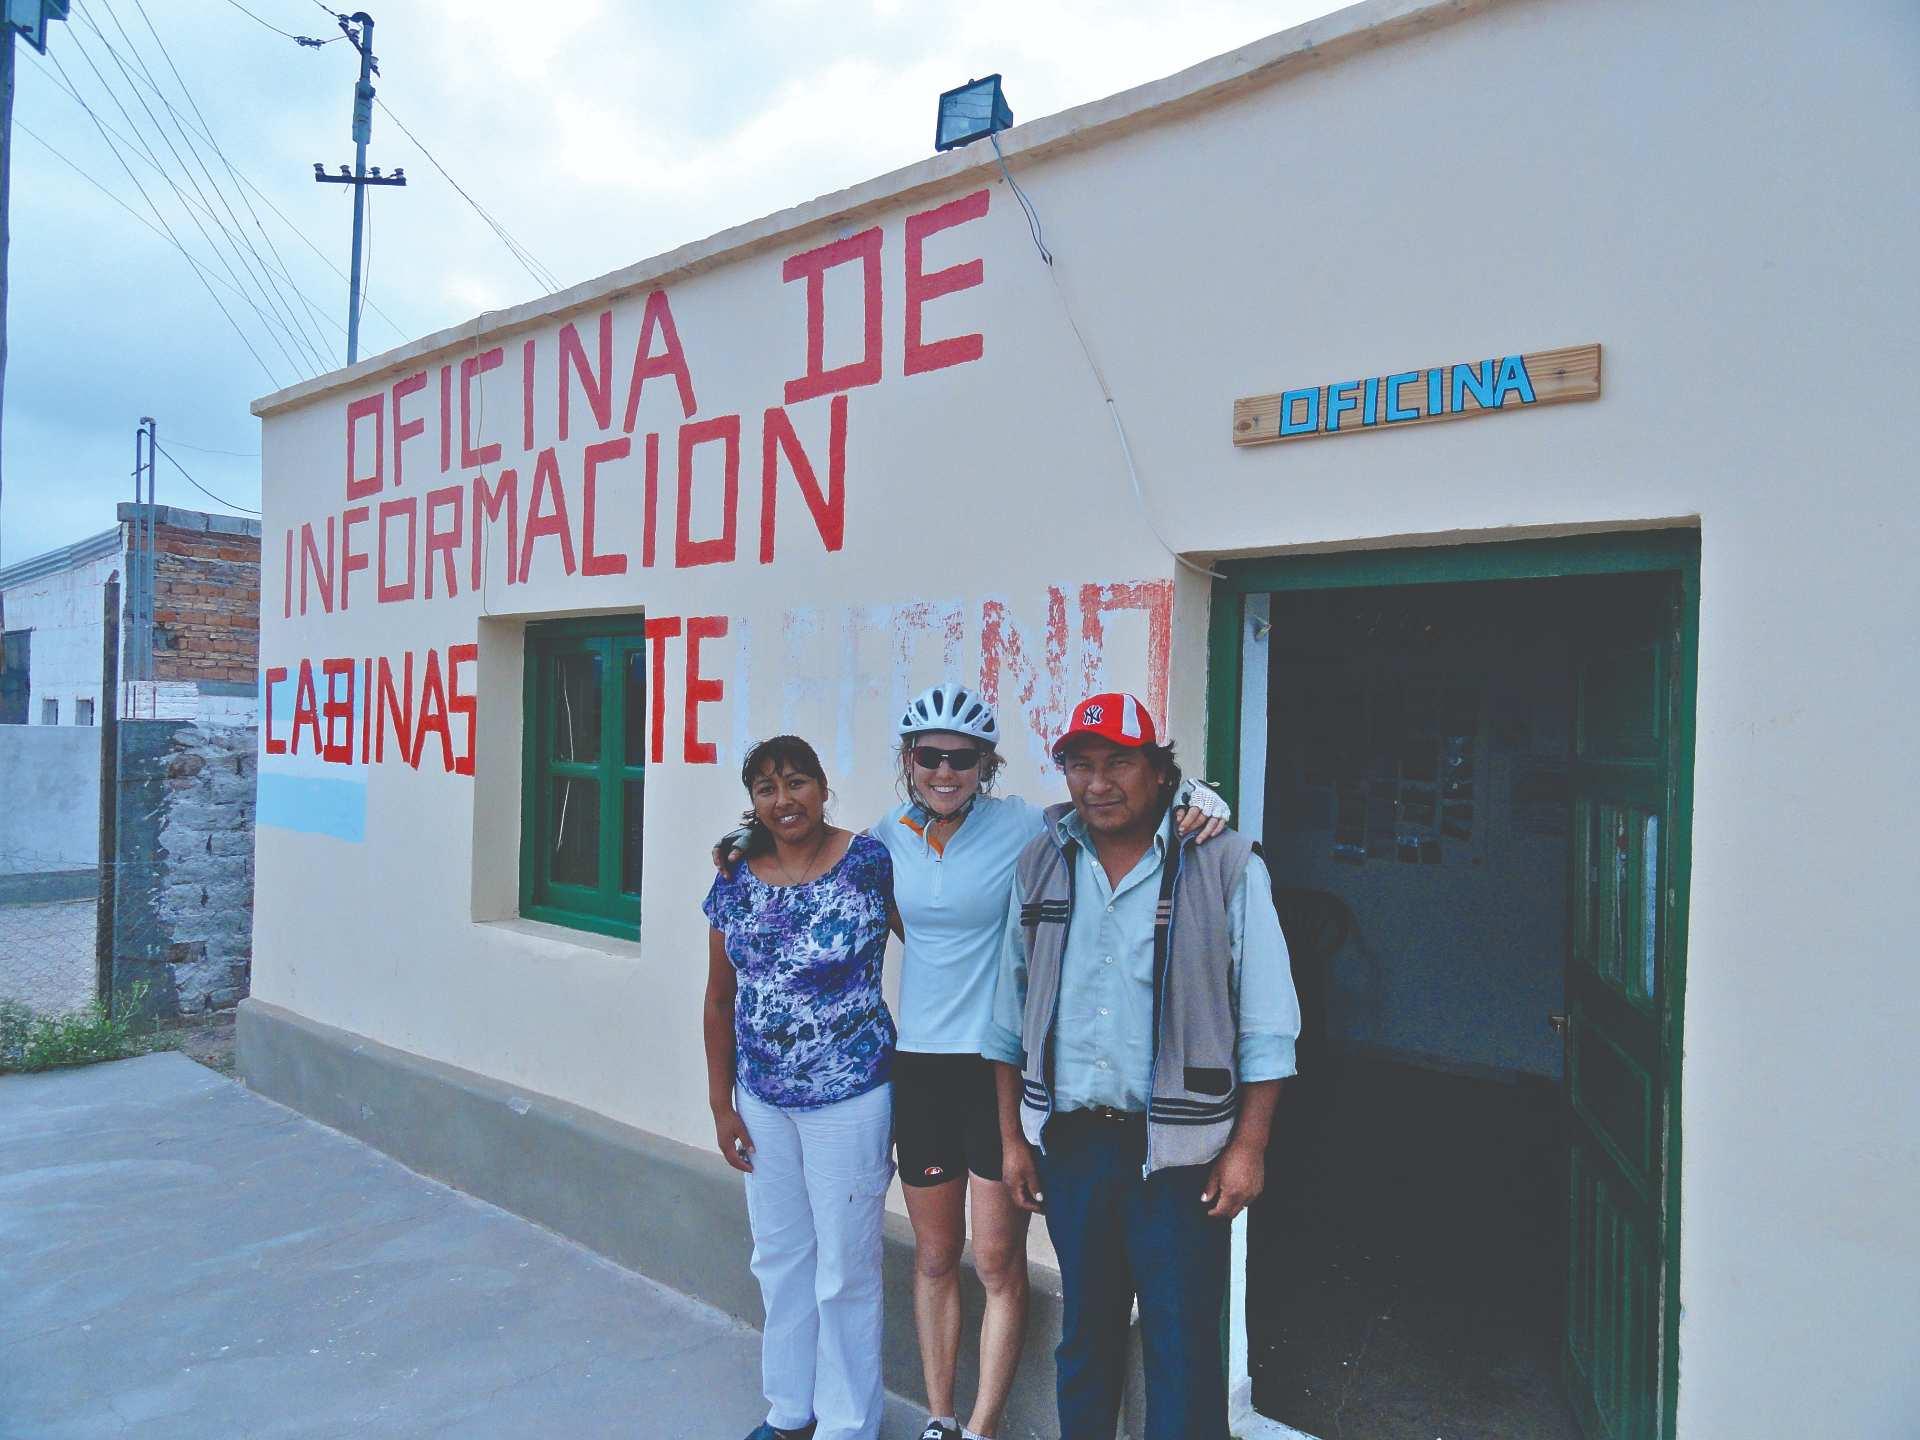 Patagonia road trip, Andes, cycling trip